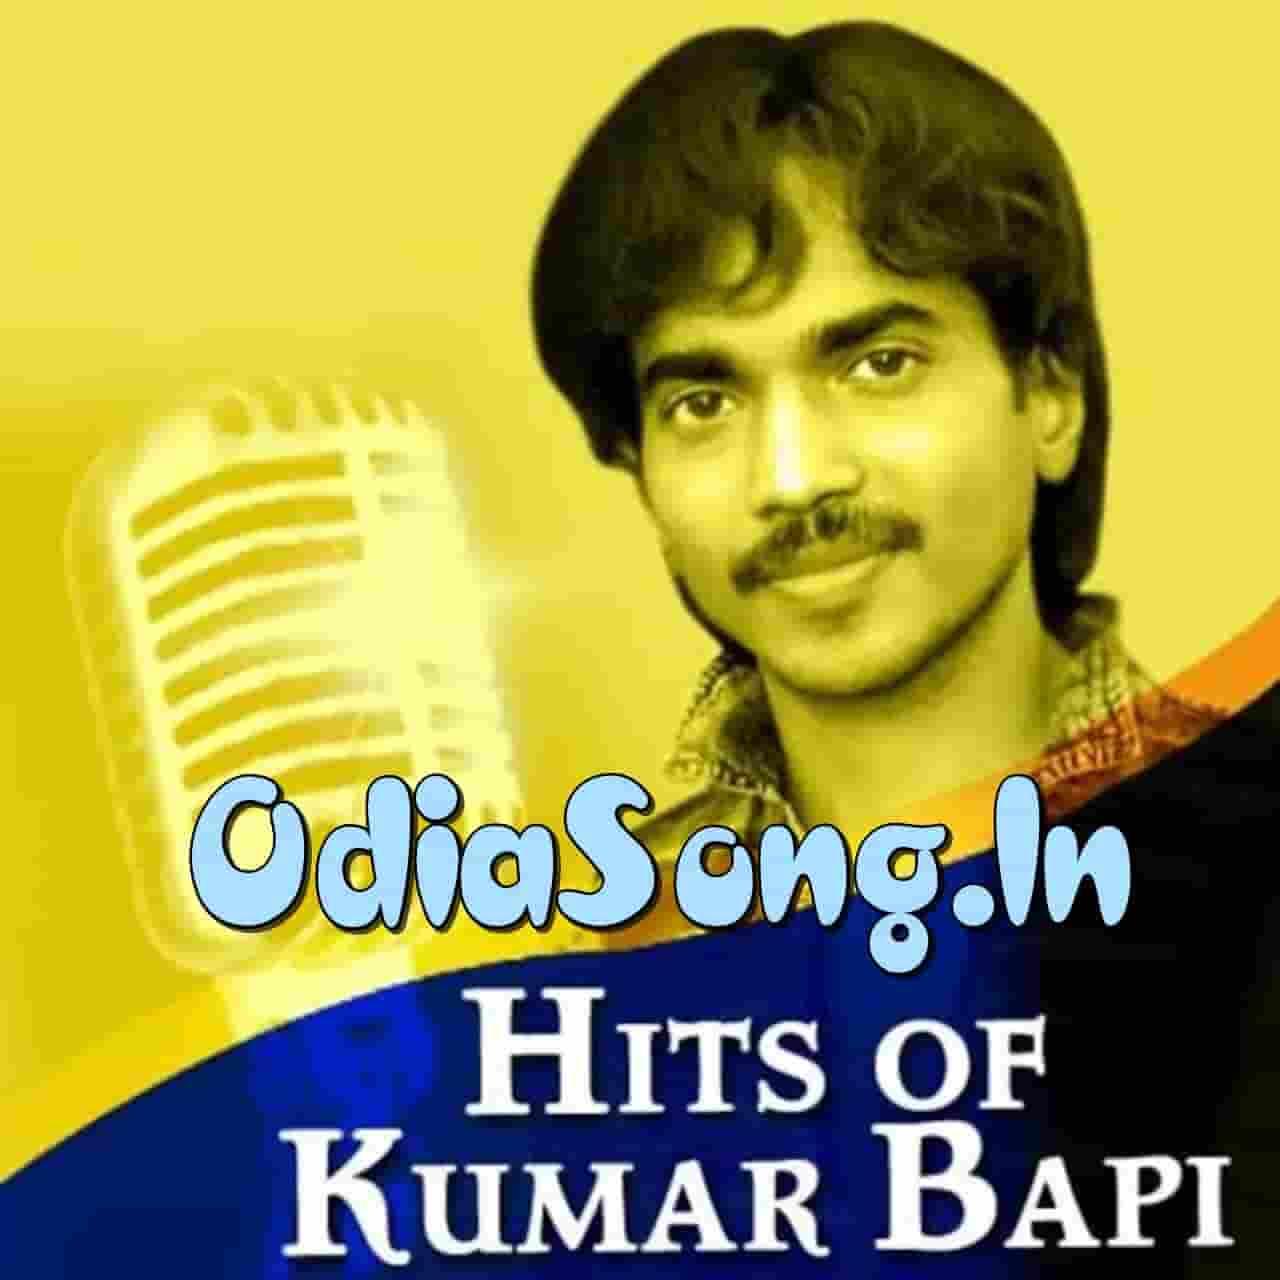 Gundicha Jatare - Jagannth Bhajan Song Kumar Bapi